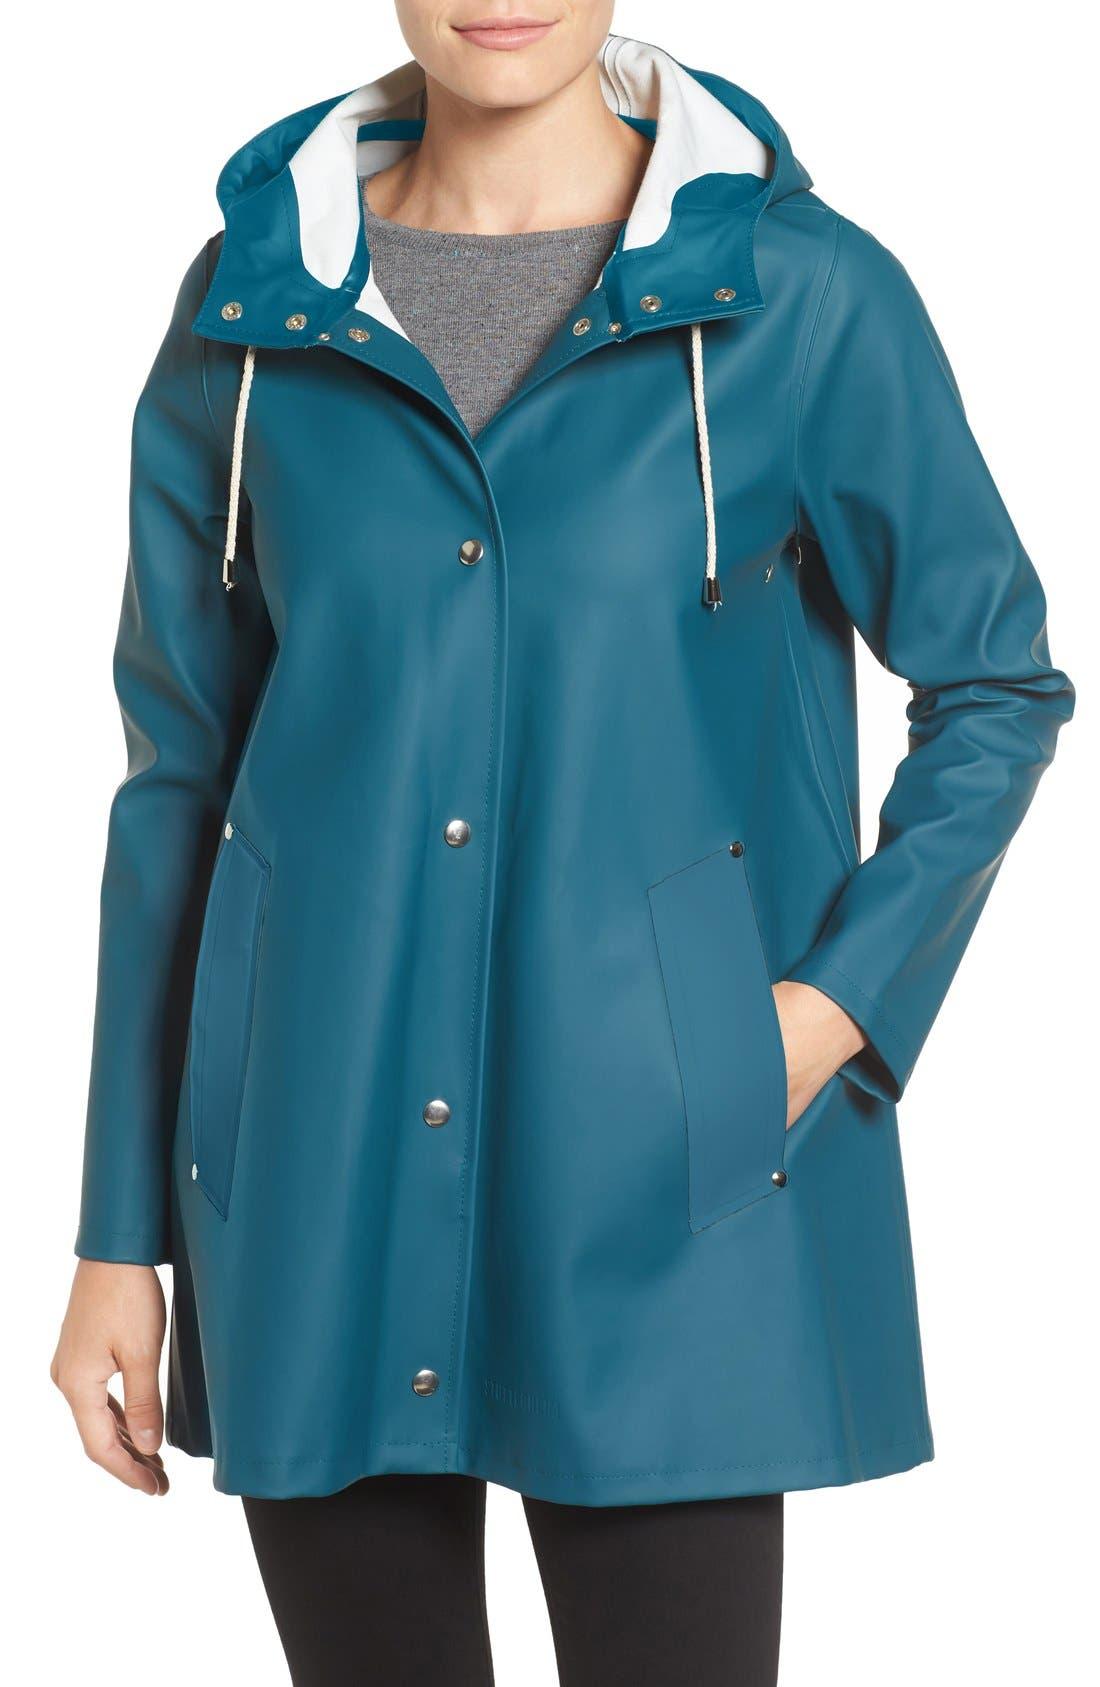 Main Image - Stutterheim Mosebacke Waterproof A-Line Raincoat